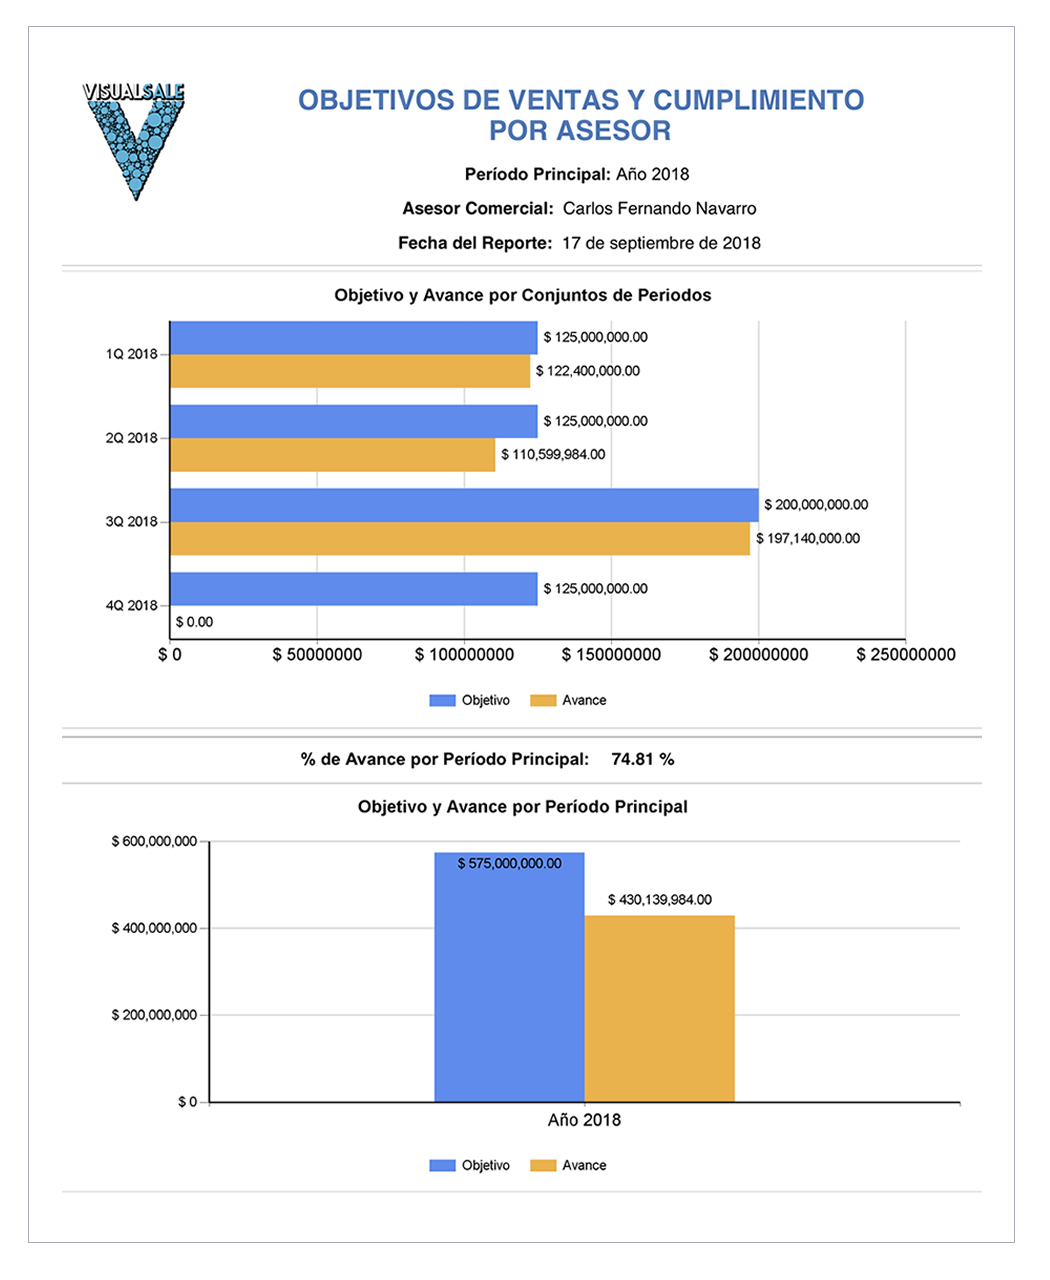 Reporte Cumplimiento Objetivos Asesor A VisualSale CRM.jpg